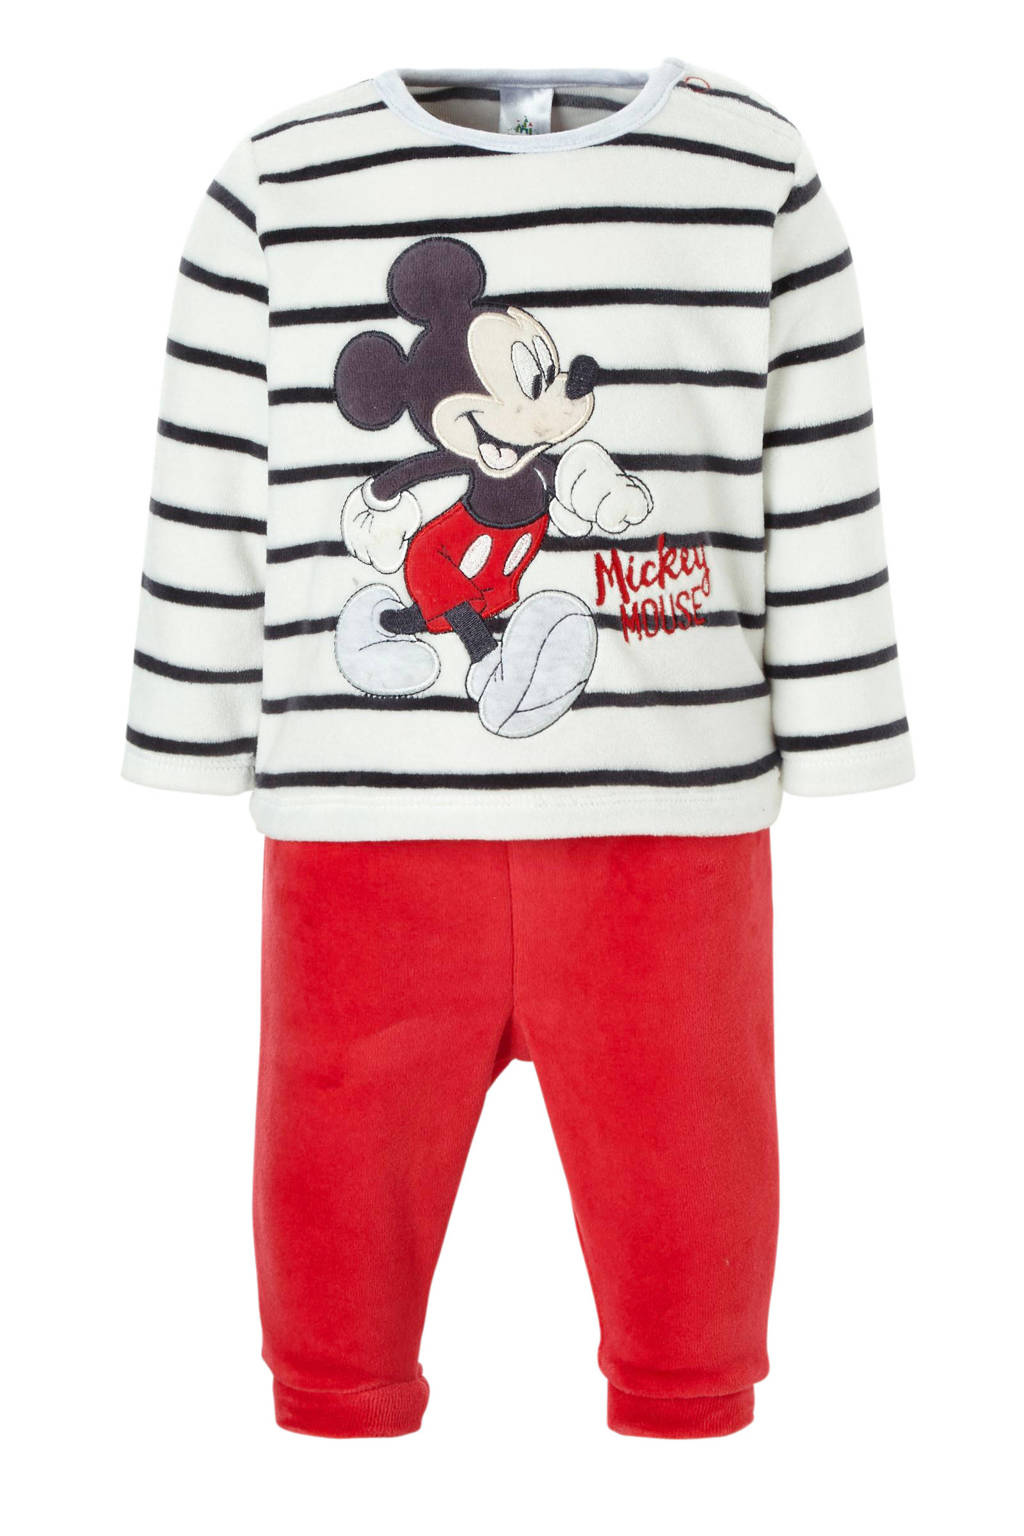 C&A Baby Club   Mickey Mouse velours pyjama met strepen, Ecru/blauw/rood